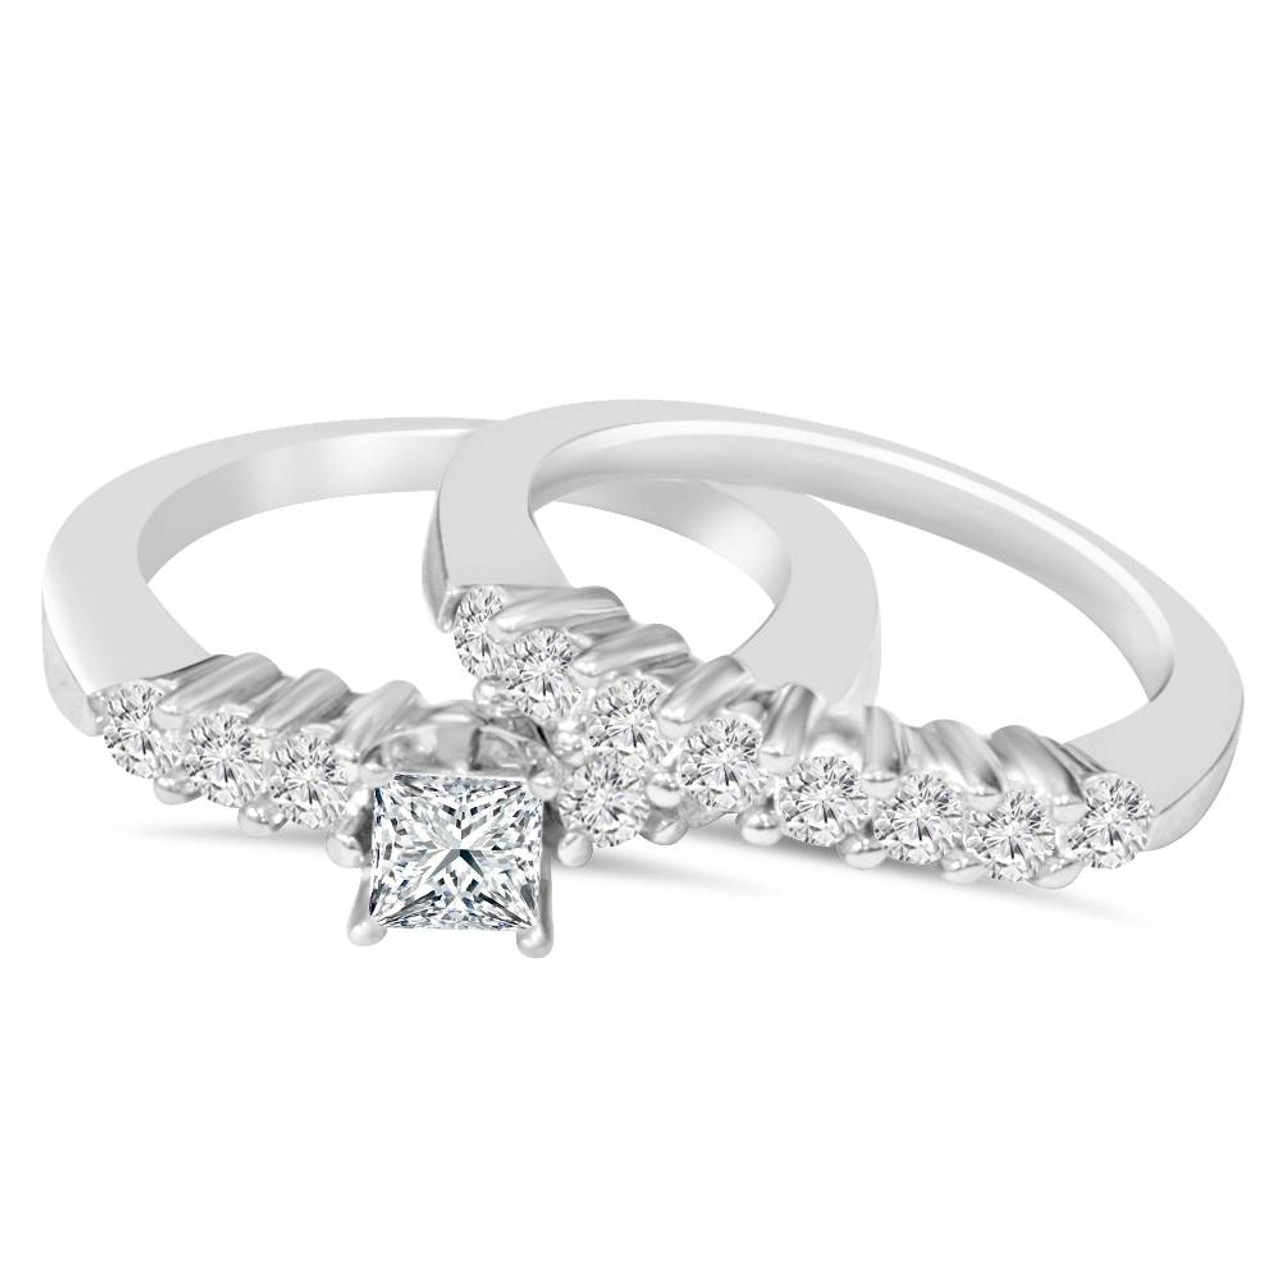 70fd94d66 Princess Cut Diamond Engagement Ring Set 1 1/4ct Matching Wedding ...